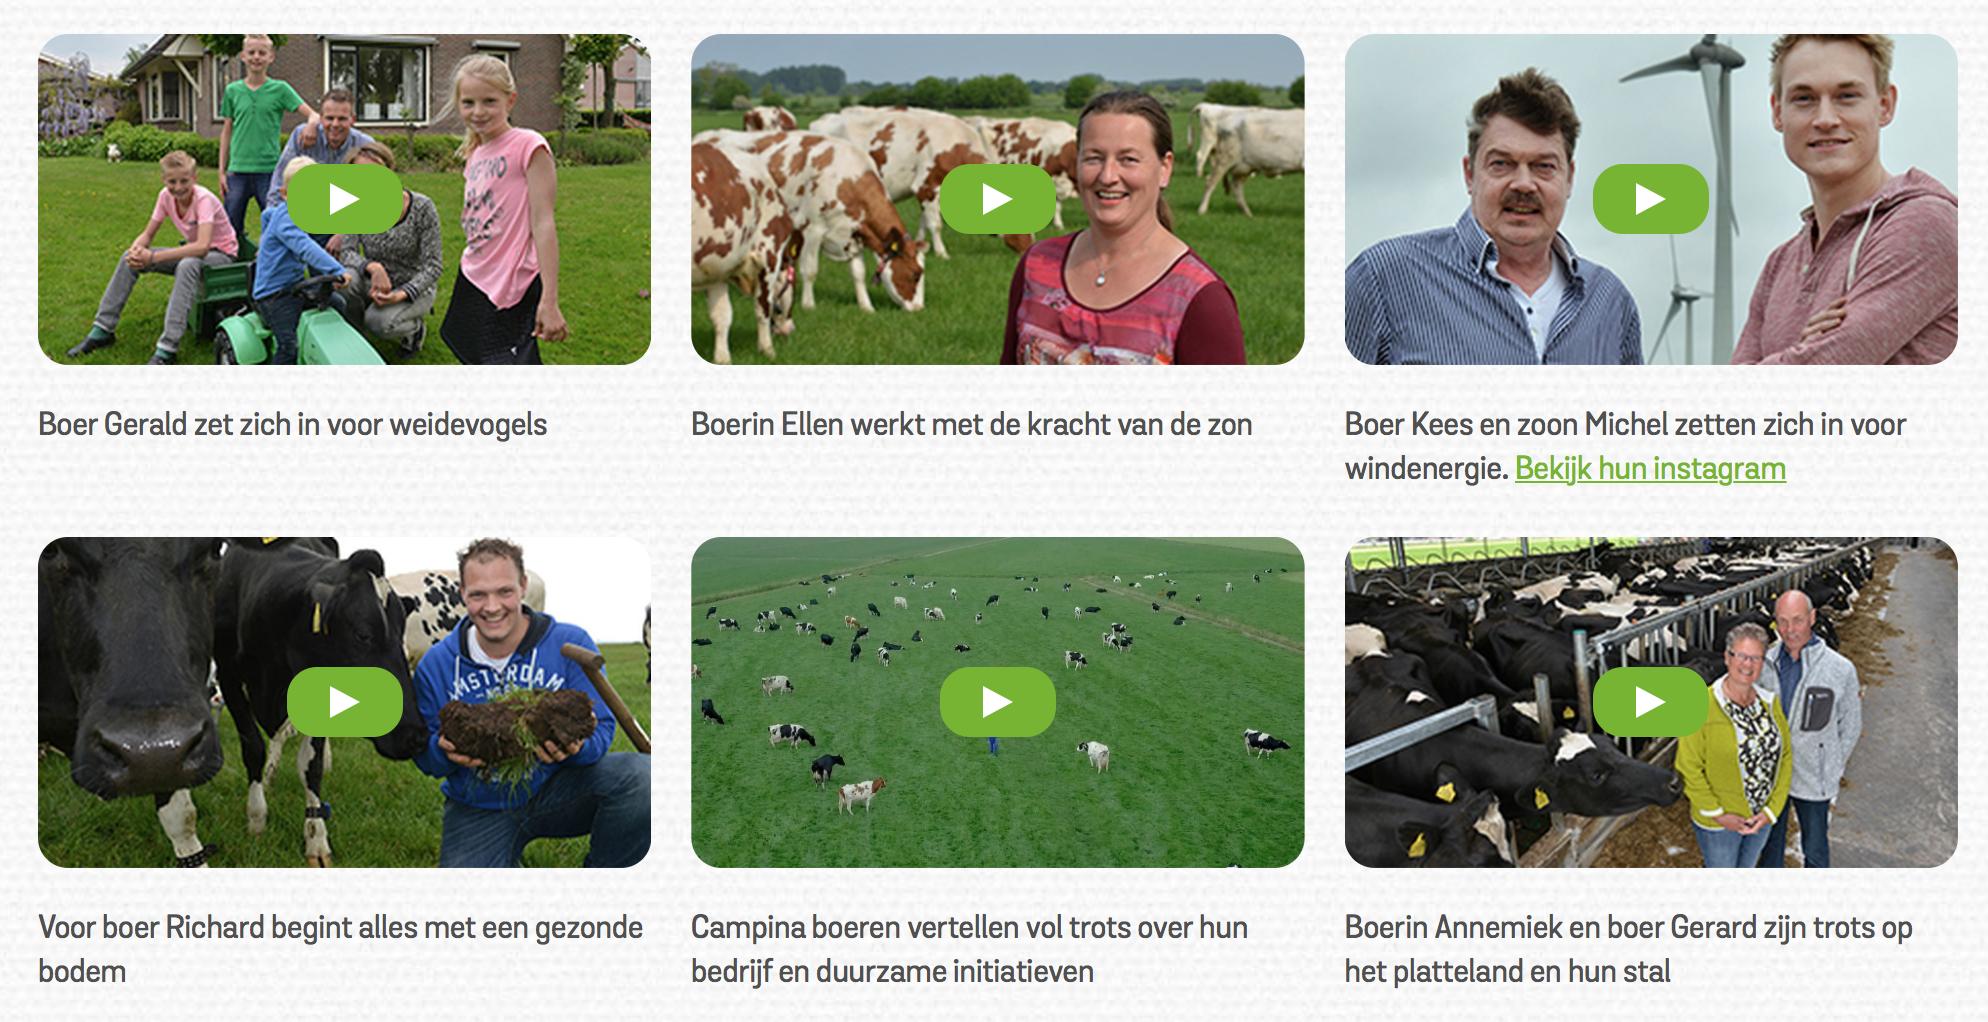 Serie video-portretten van Campina boeren